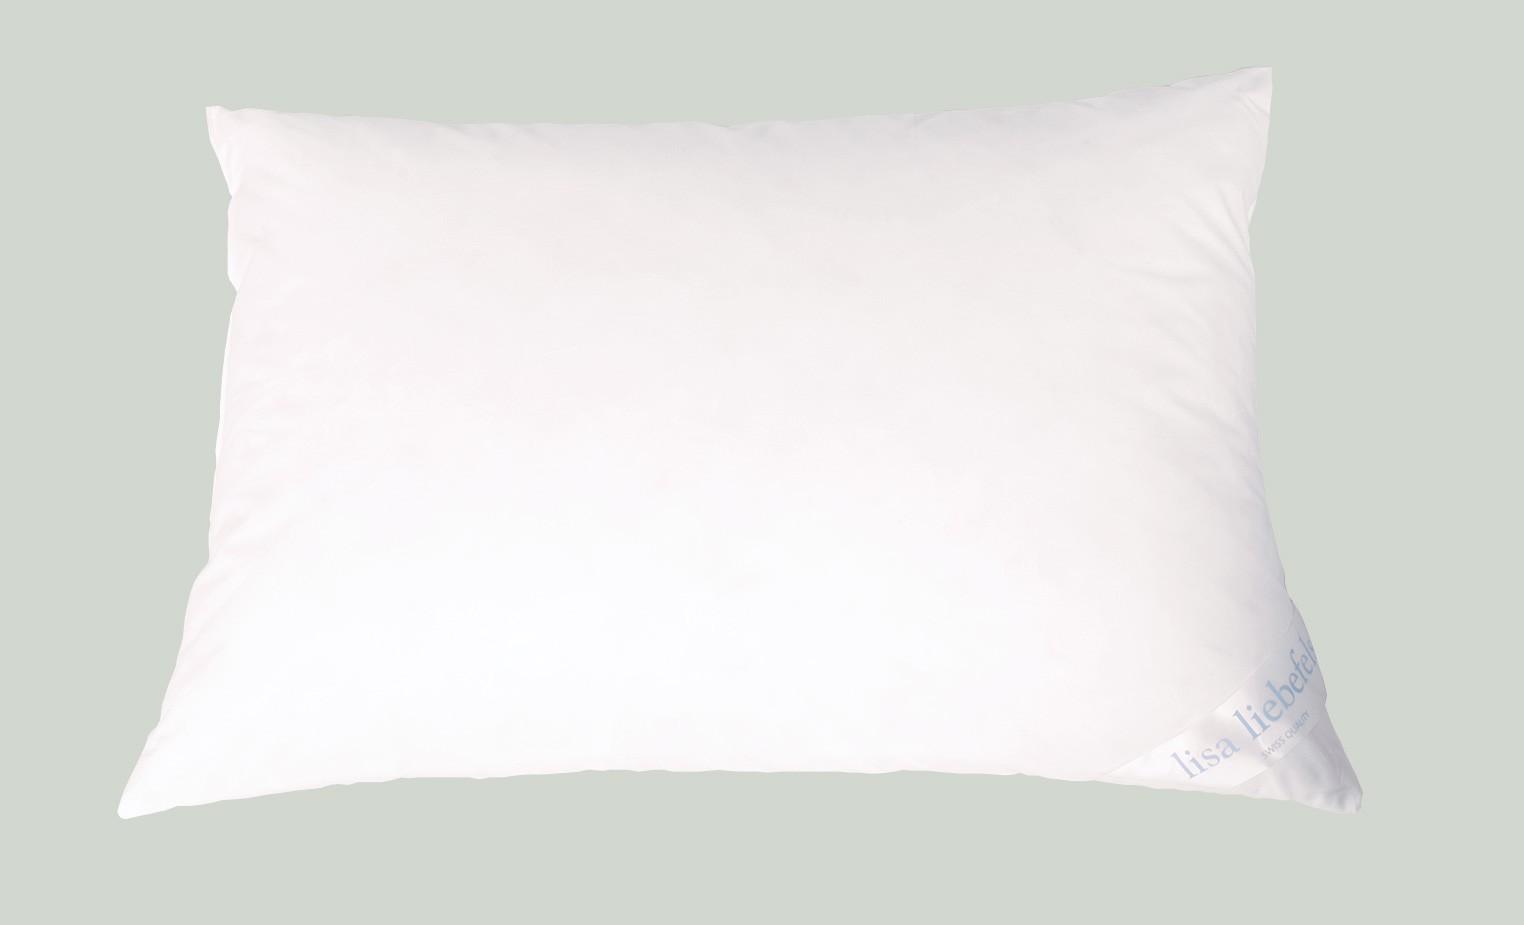 daunen komfort kissen kologische daunen swiss made. Black Bedroom Furniture Sets. Home Design Ideas